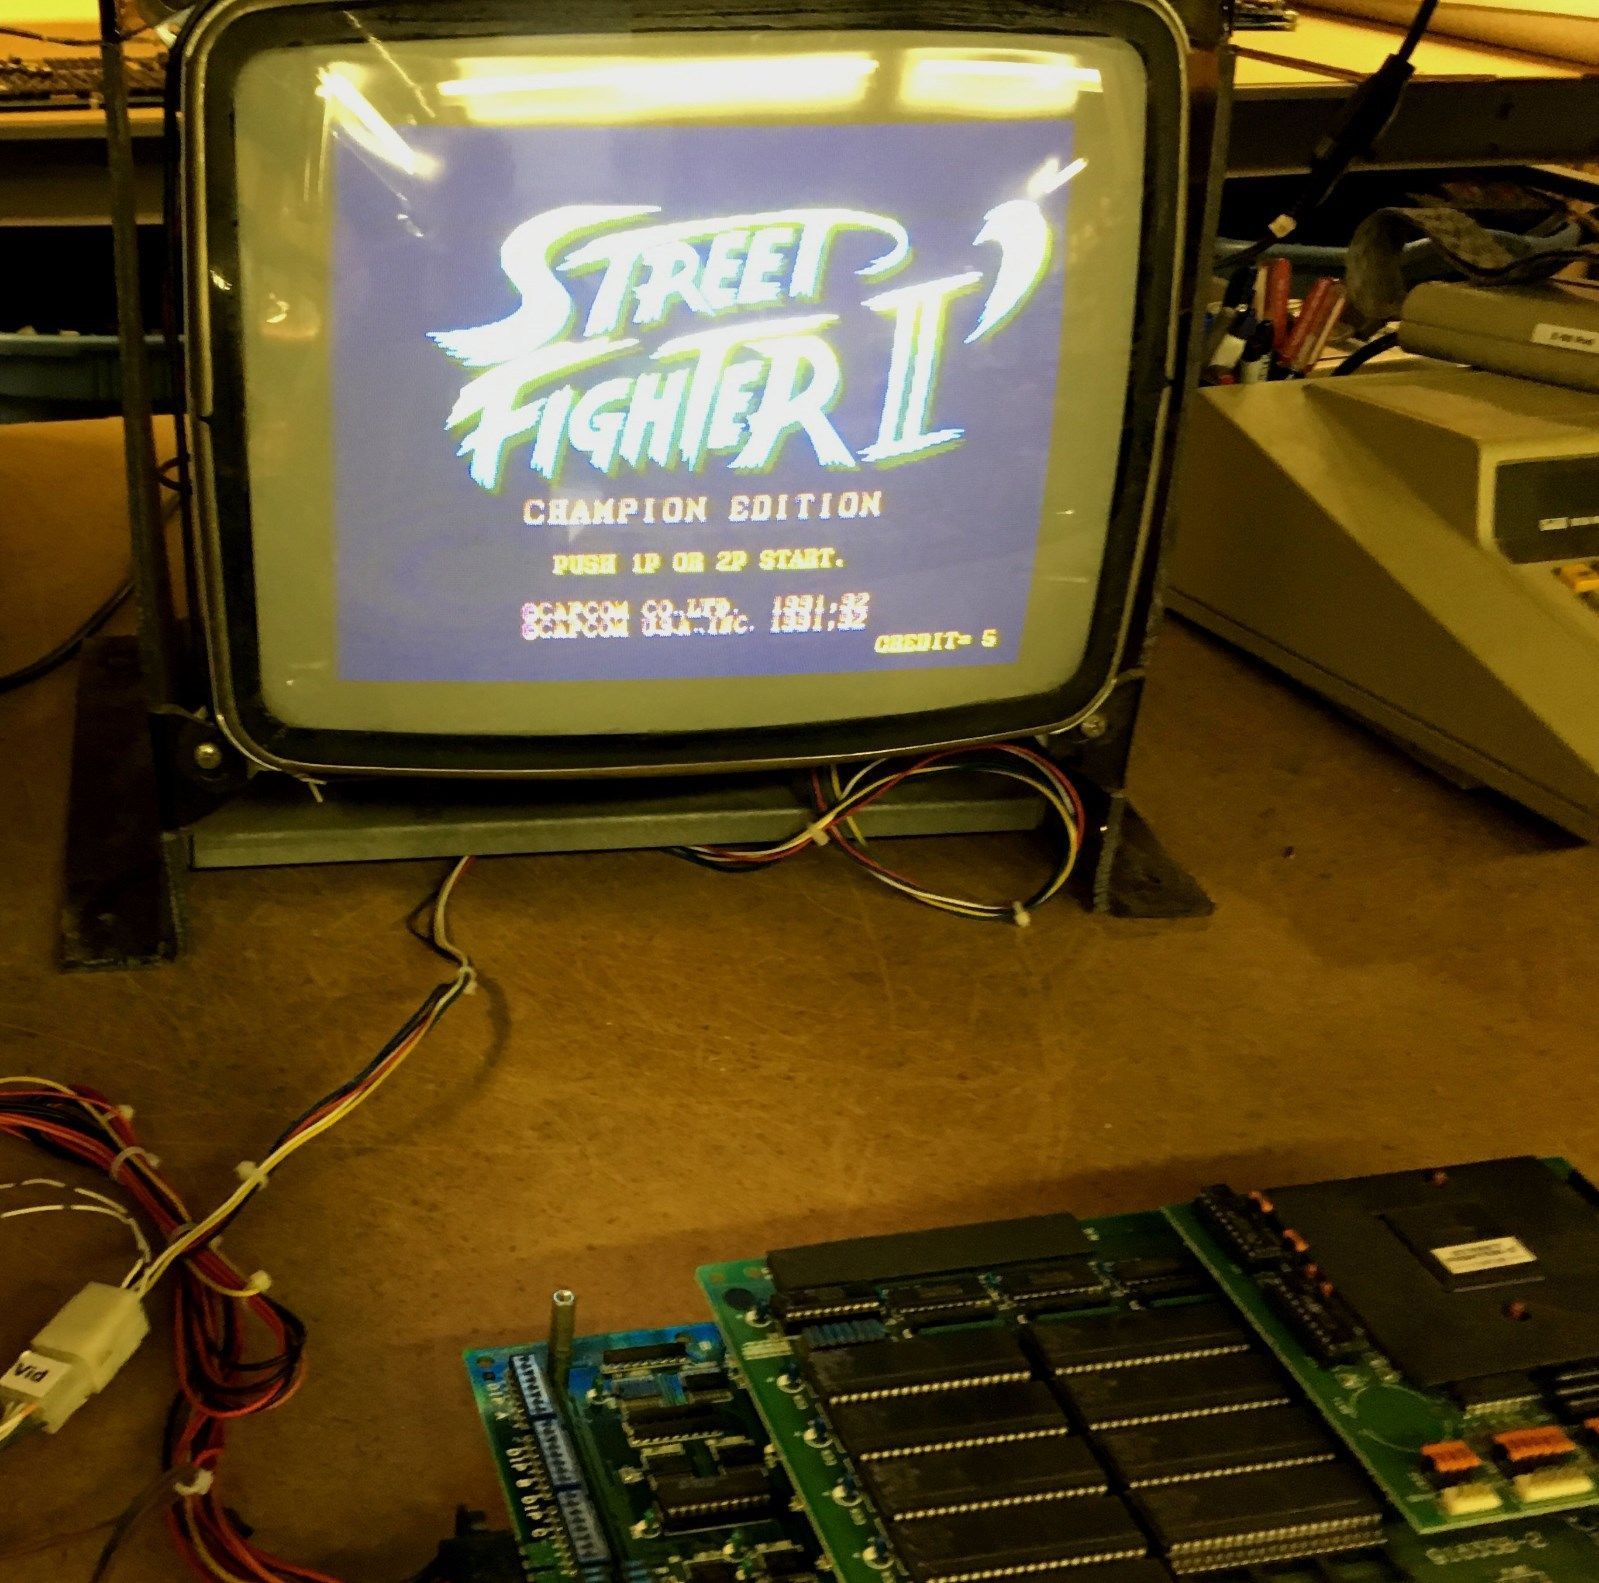 Street Fighter Ii Champion Edition Capcom Jamma Arcade Circuit Board Pcb Works Street Fighter Ii 2 Million Dollars Circuit